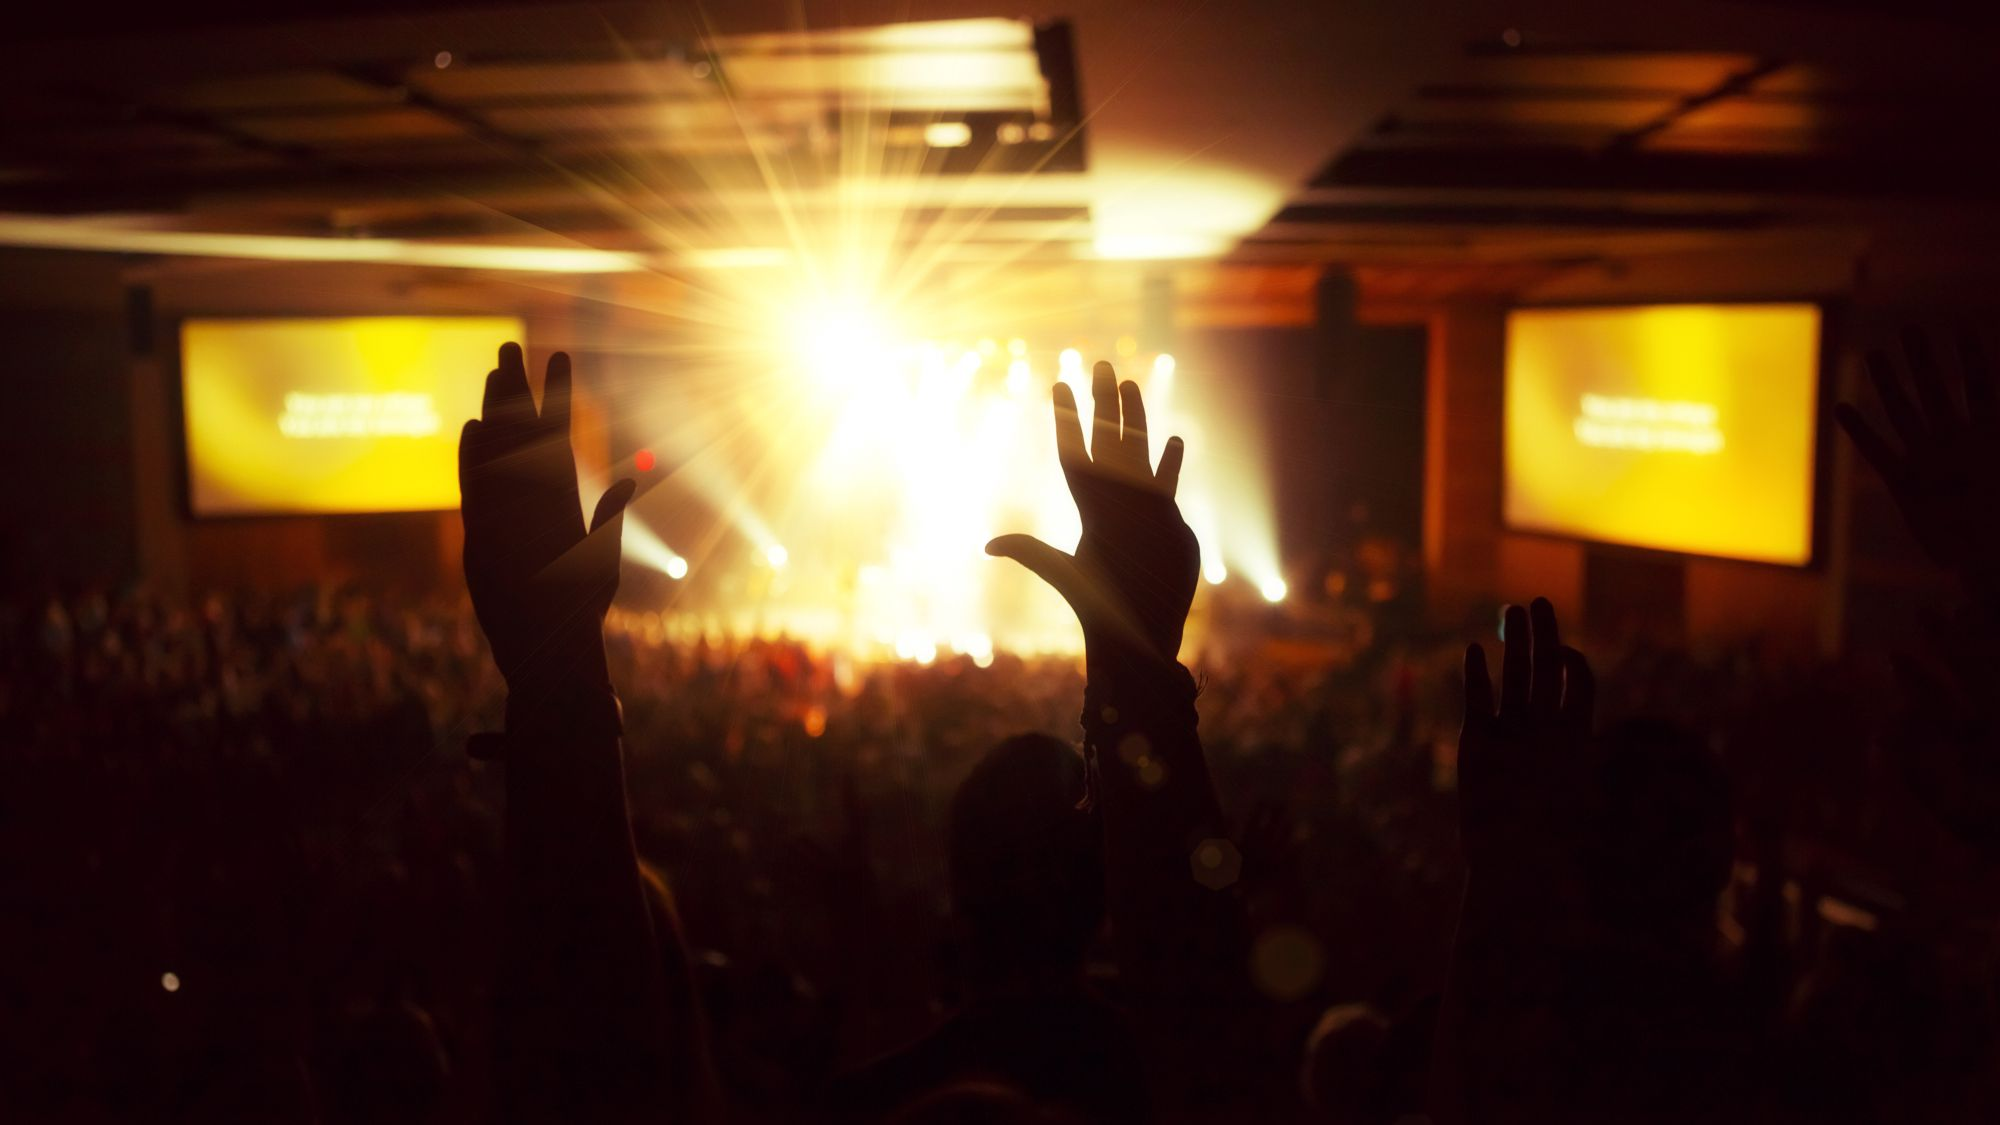 Top 10 Christian Music Live Concert Videos